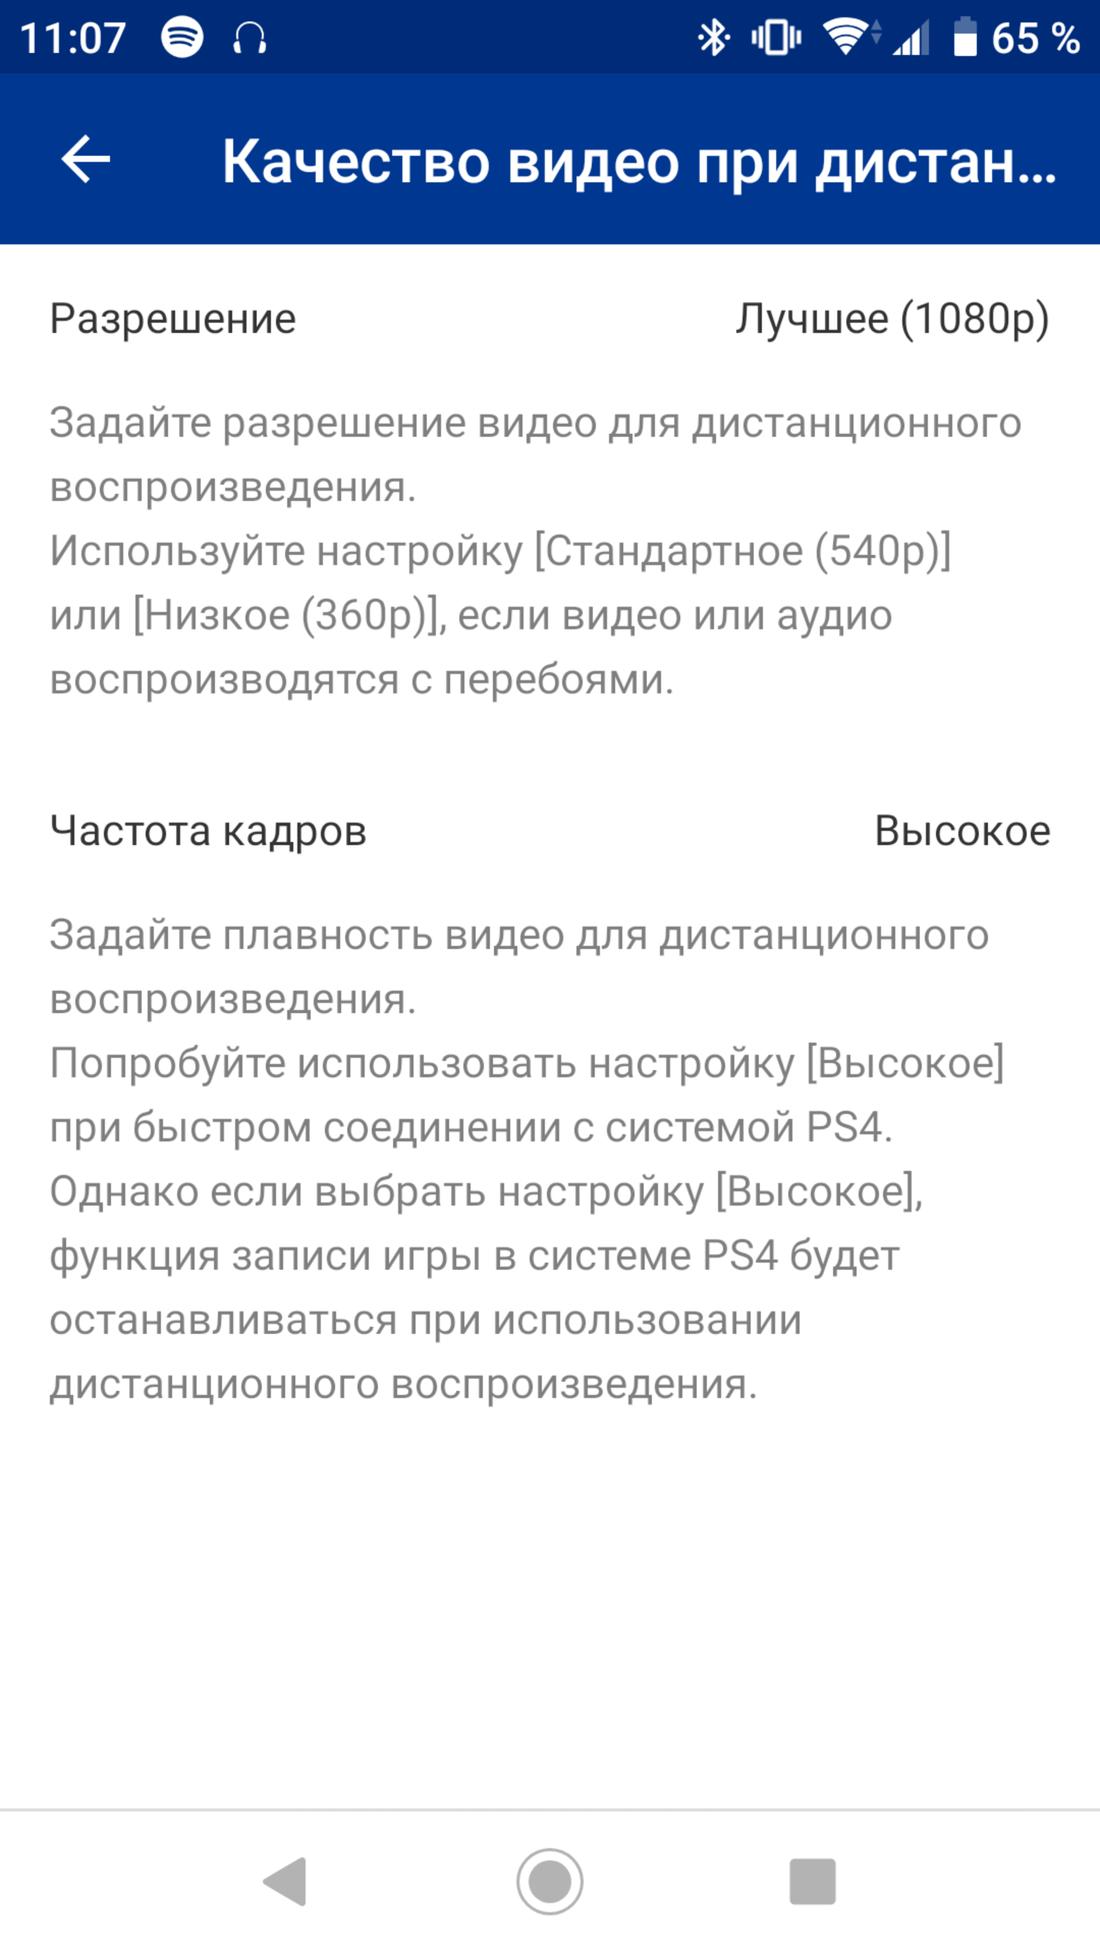 Скриншот #3 из программы PS4 Remote Play